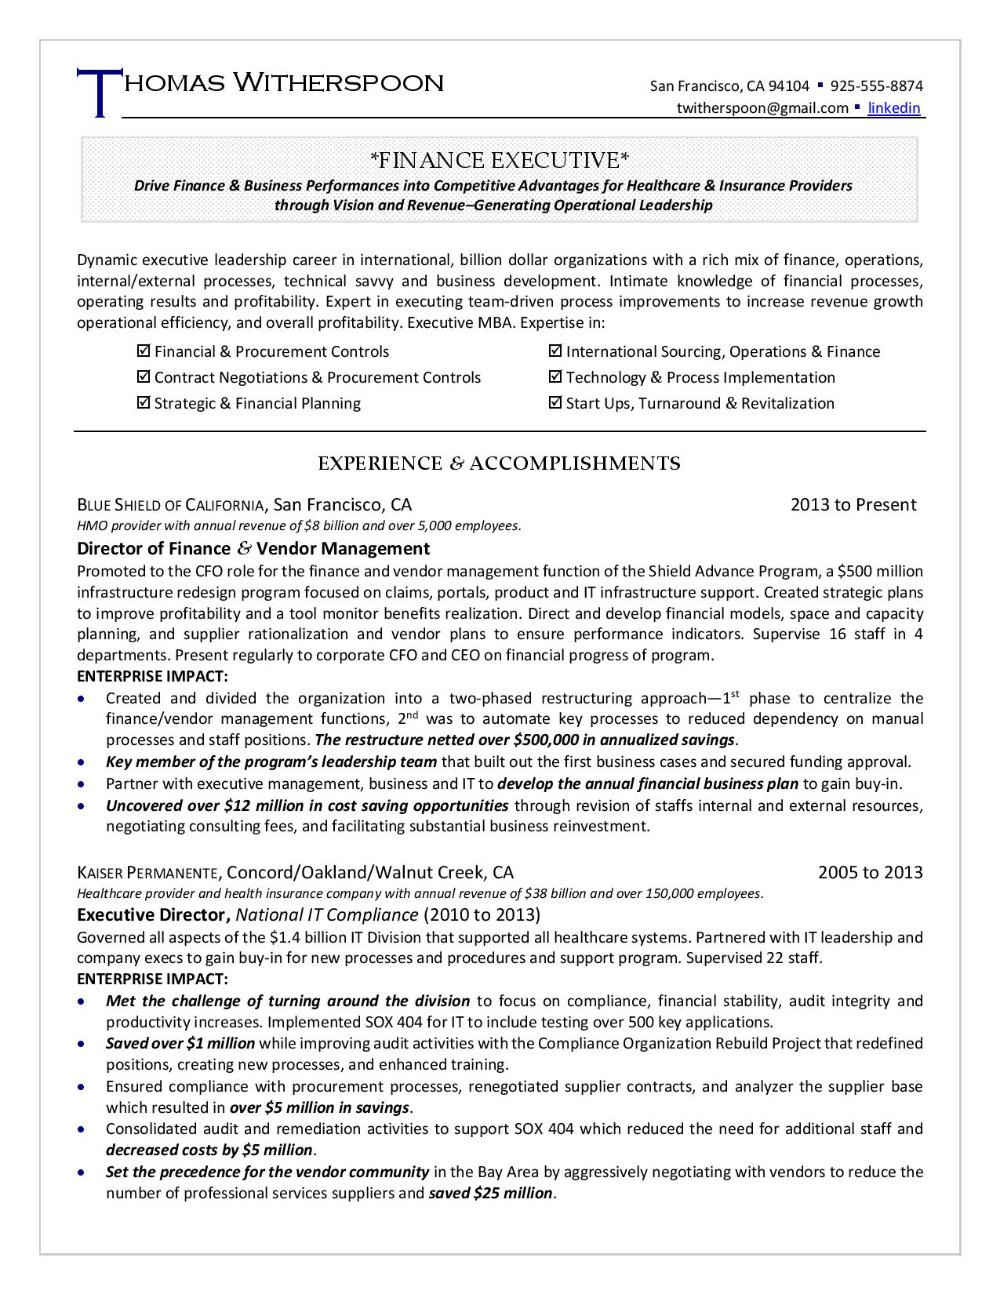 Professional resume services online surrey bc